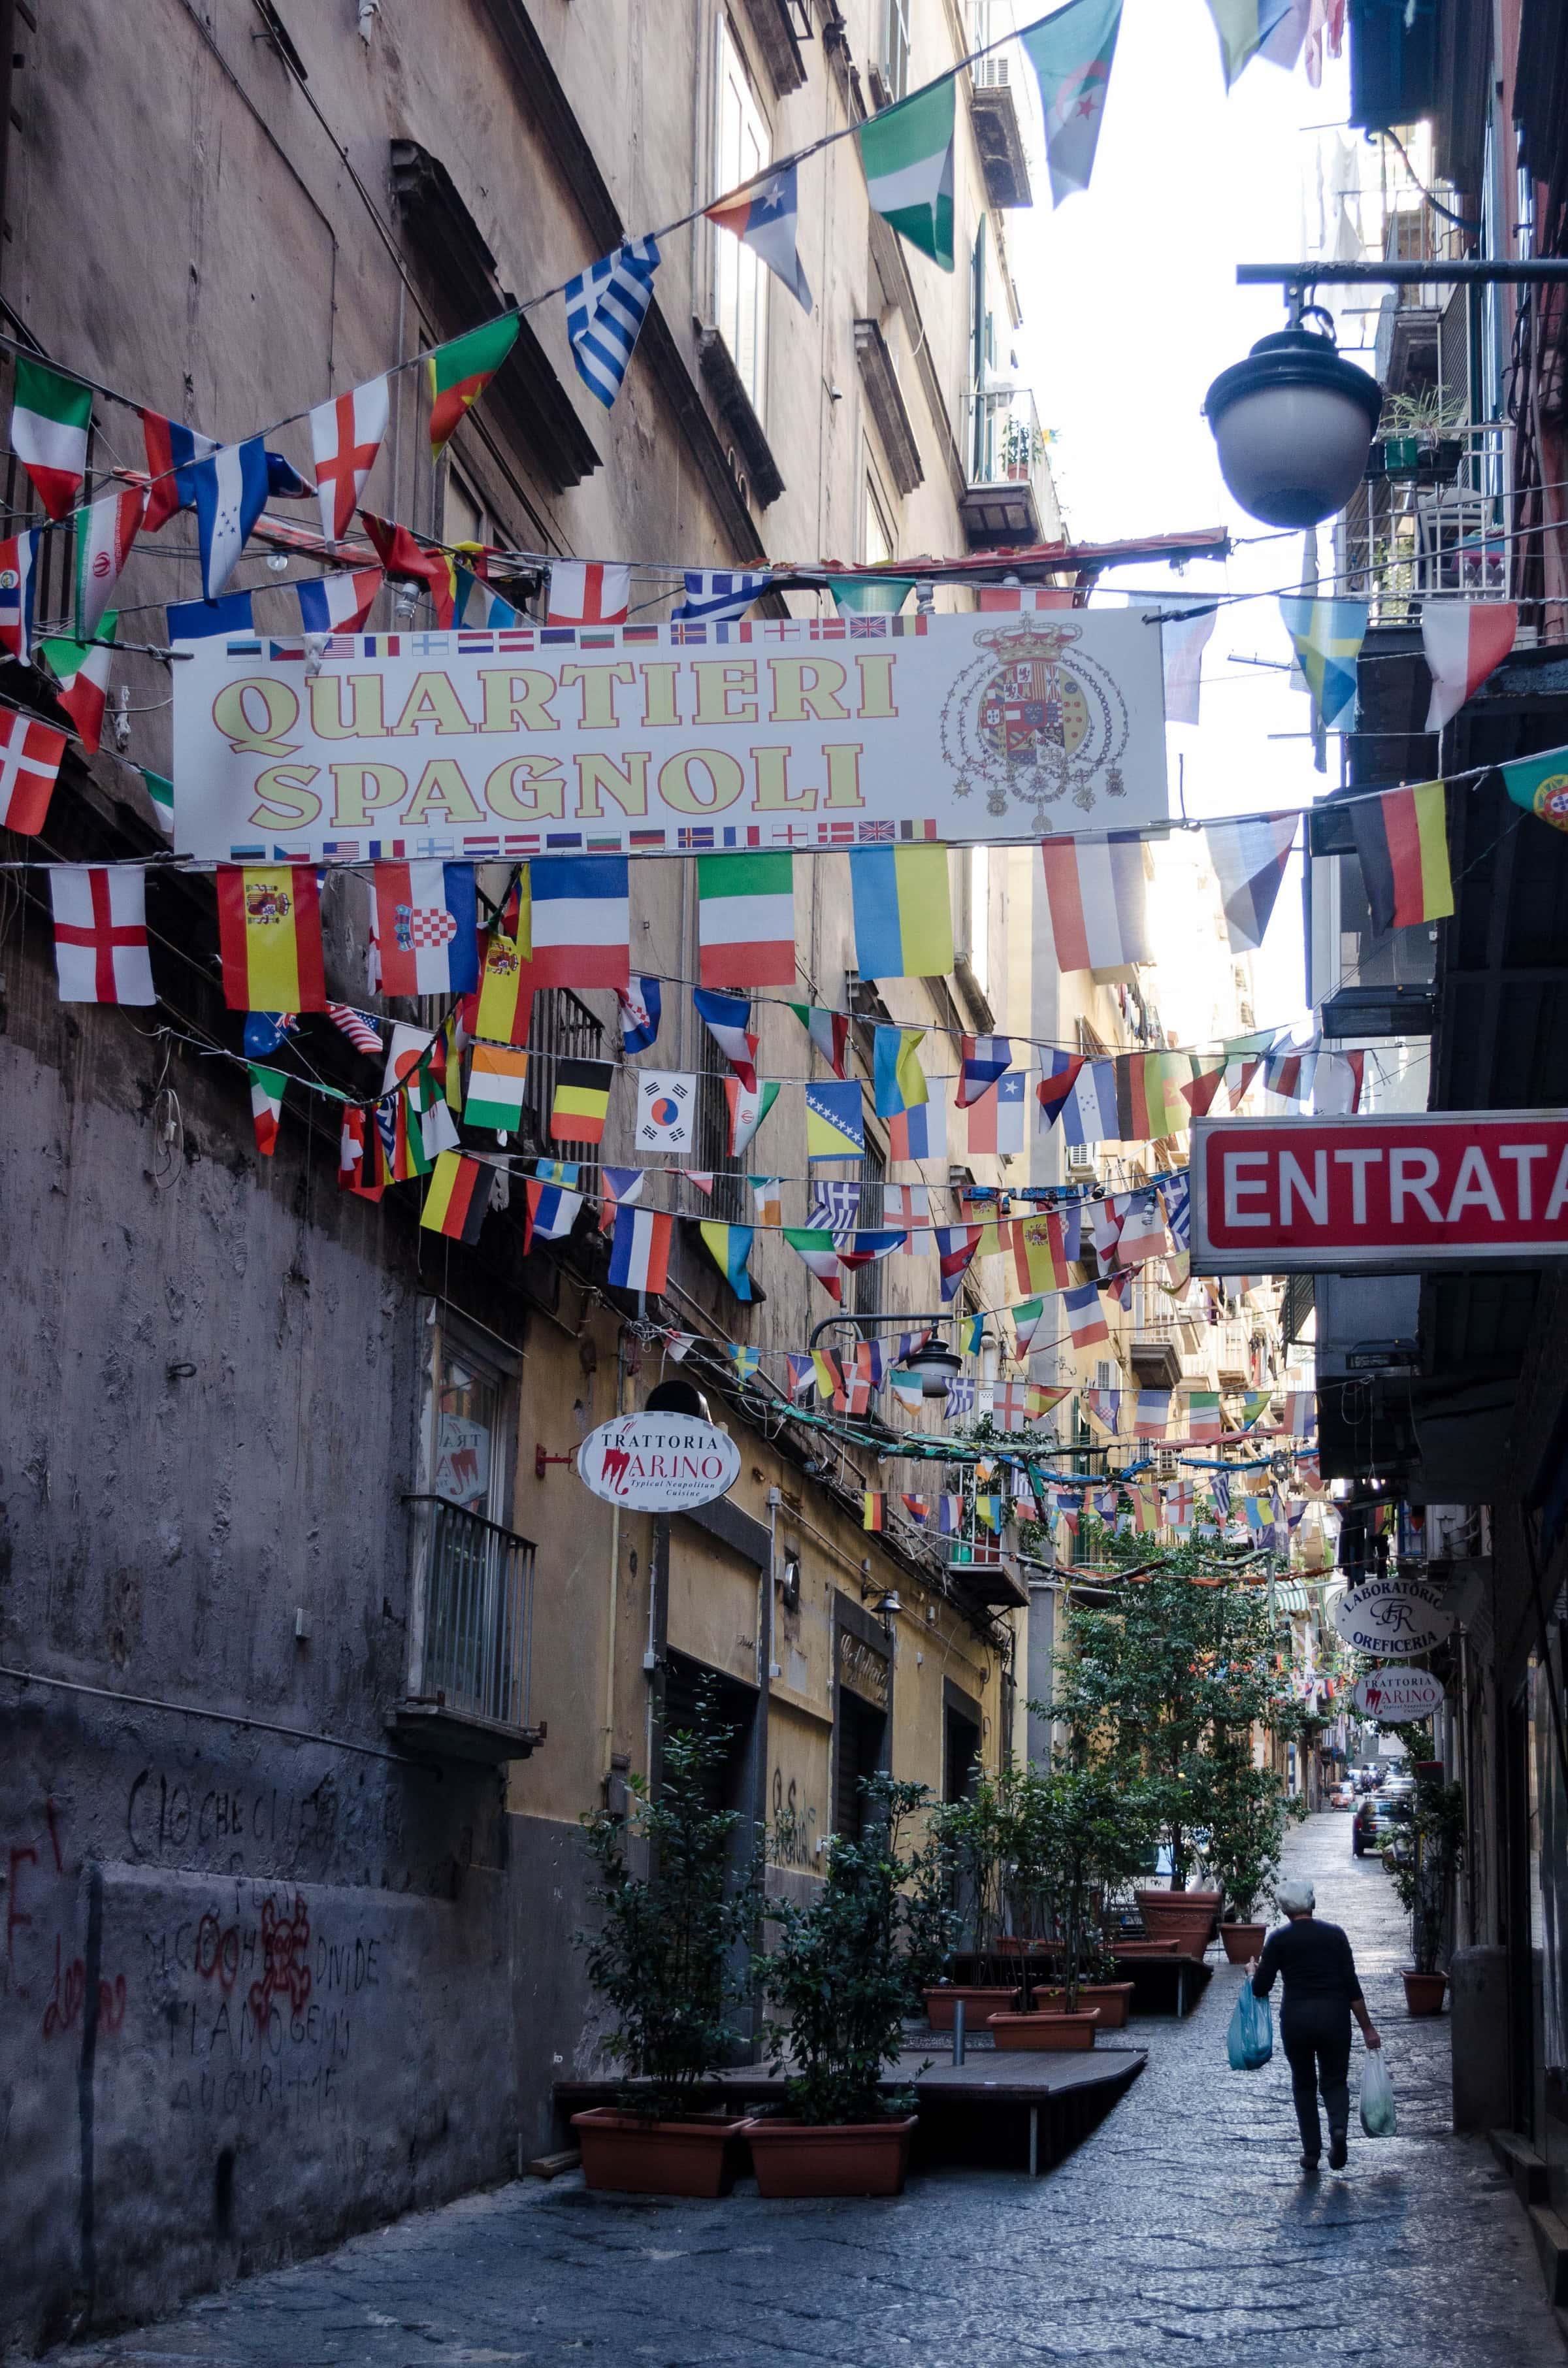 Quartieri Spagnoli in Neapel